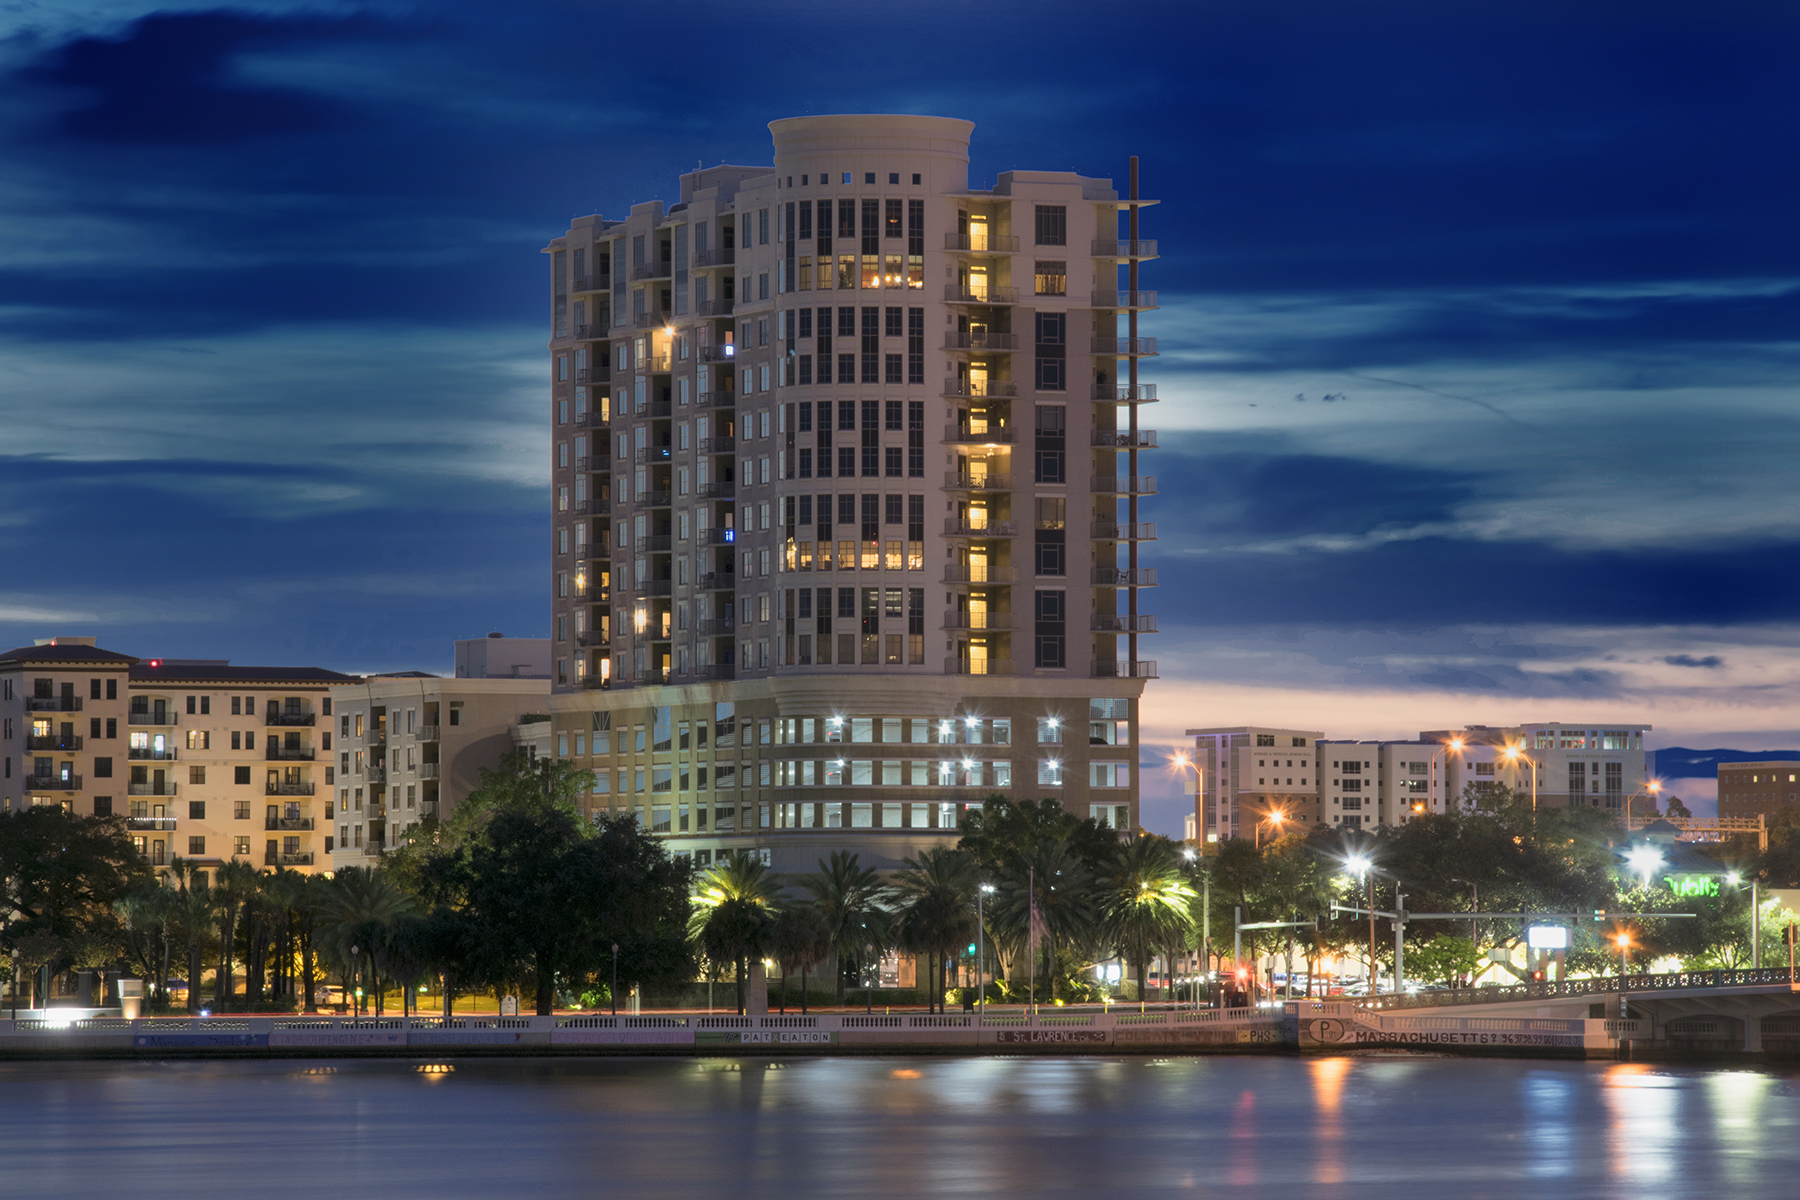 Condomínio para Venda às SOUTH TAMPA 275 Bayshore Blvd 1105 Tampa, Florida, 33606 Estados Unidos